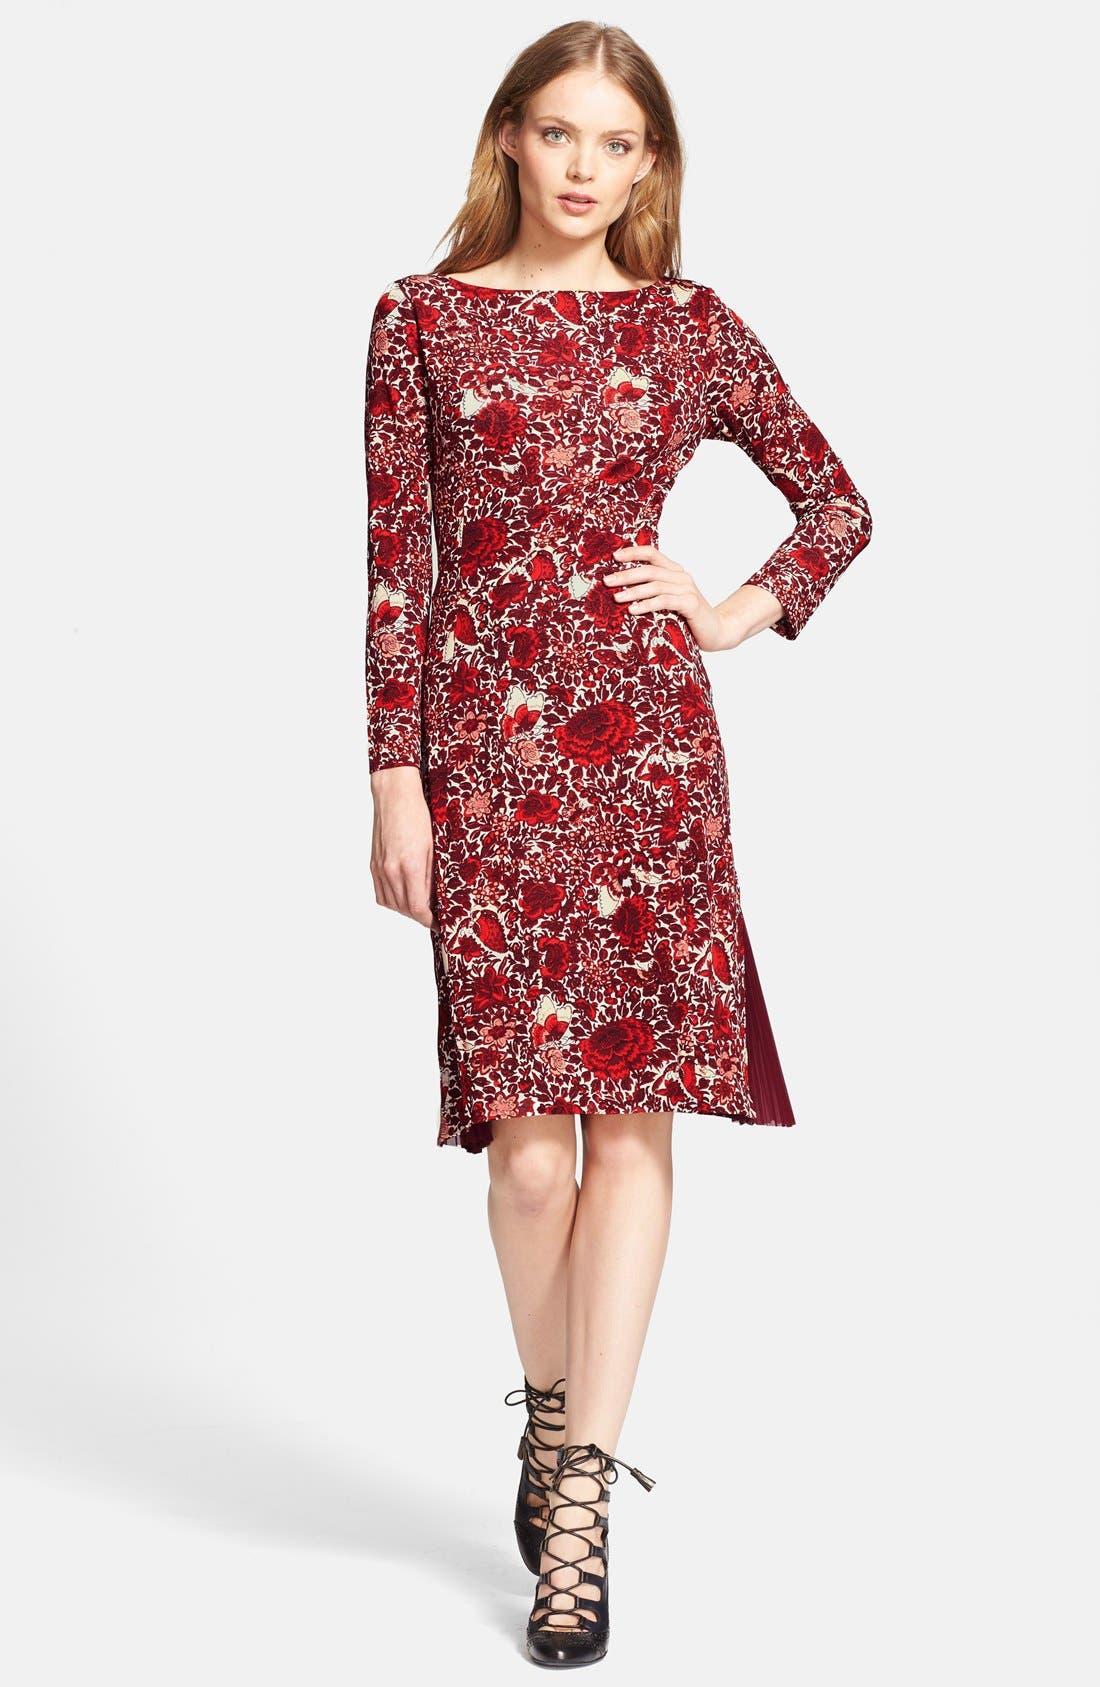 Main Image - Tory Burch 'Ria' Floral Print Shift Dress